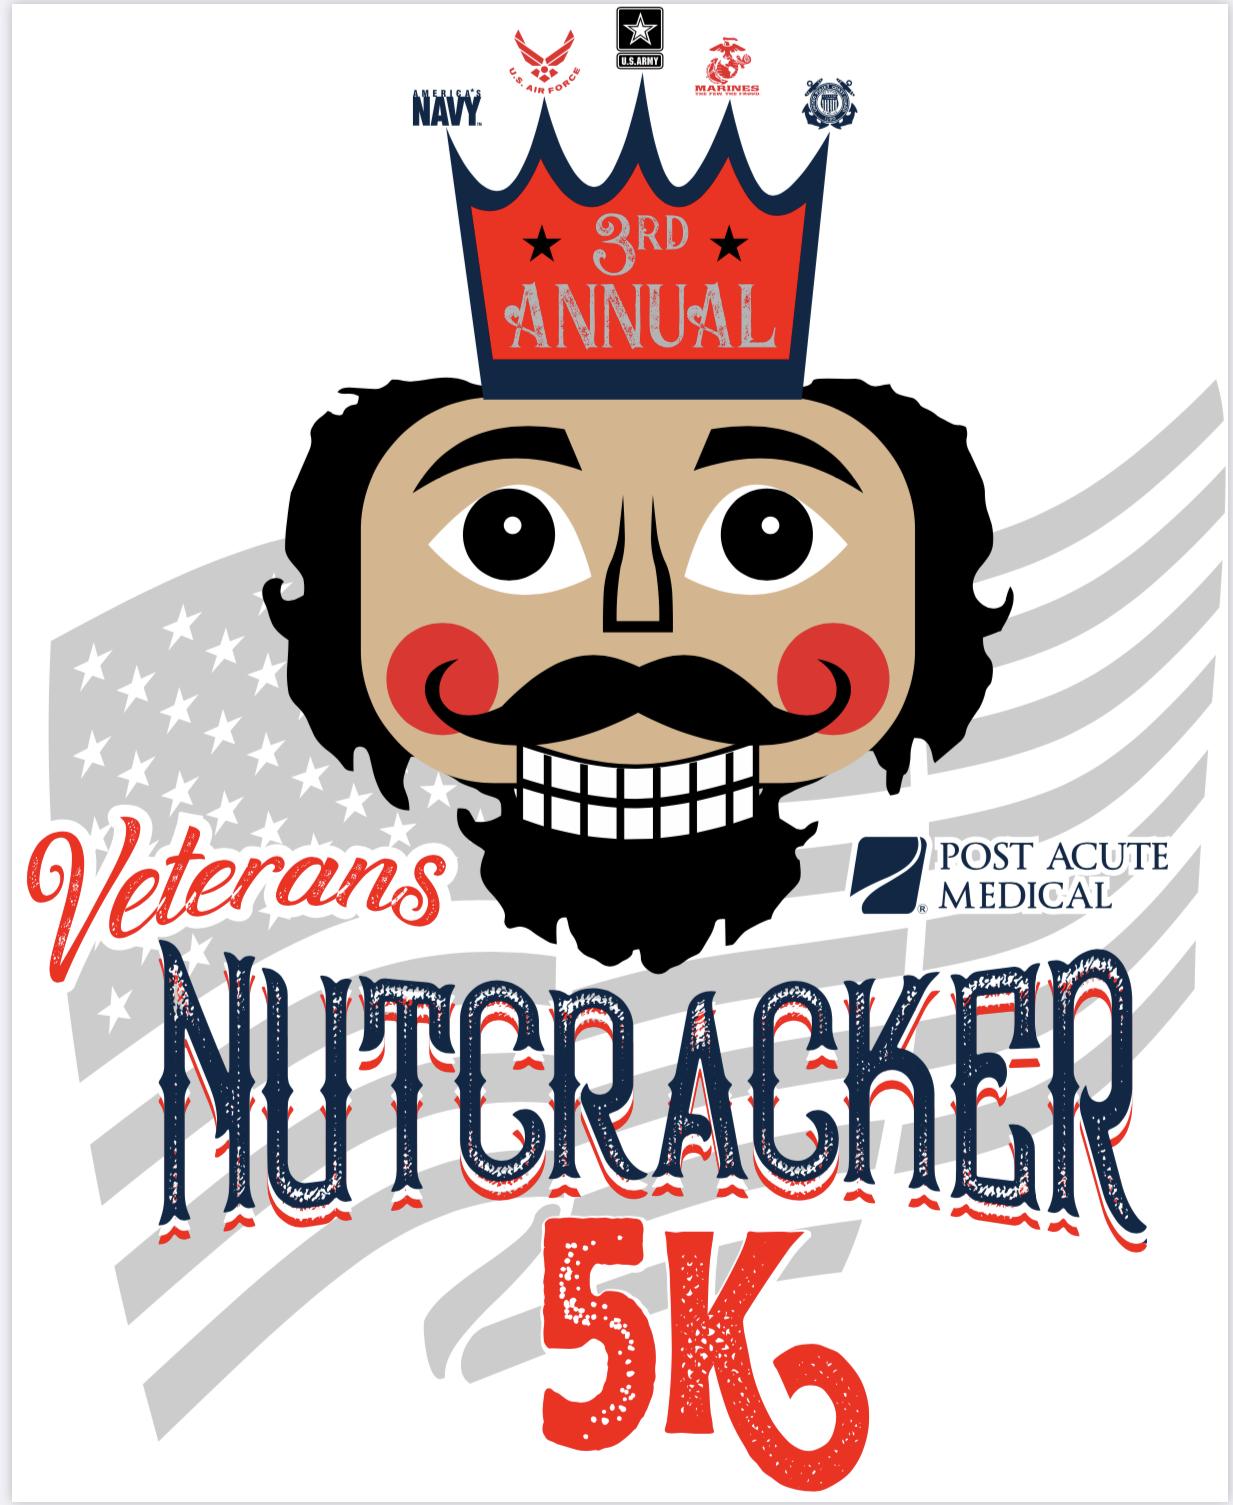 Veterans Nutcracker Run Review